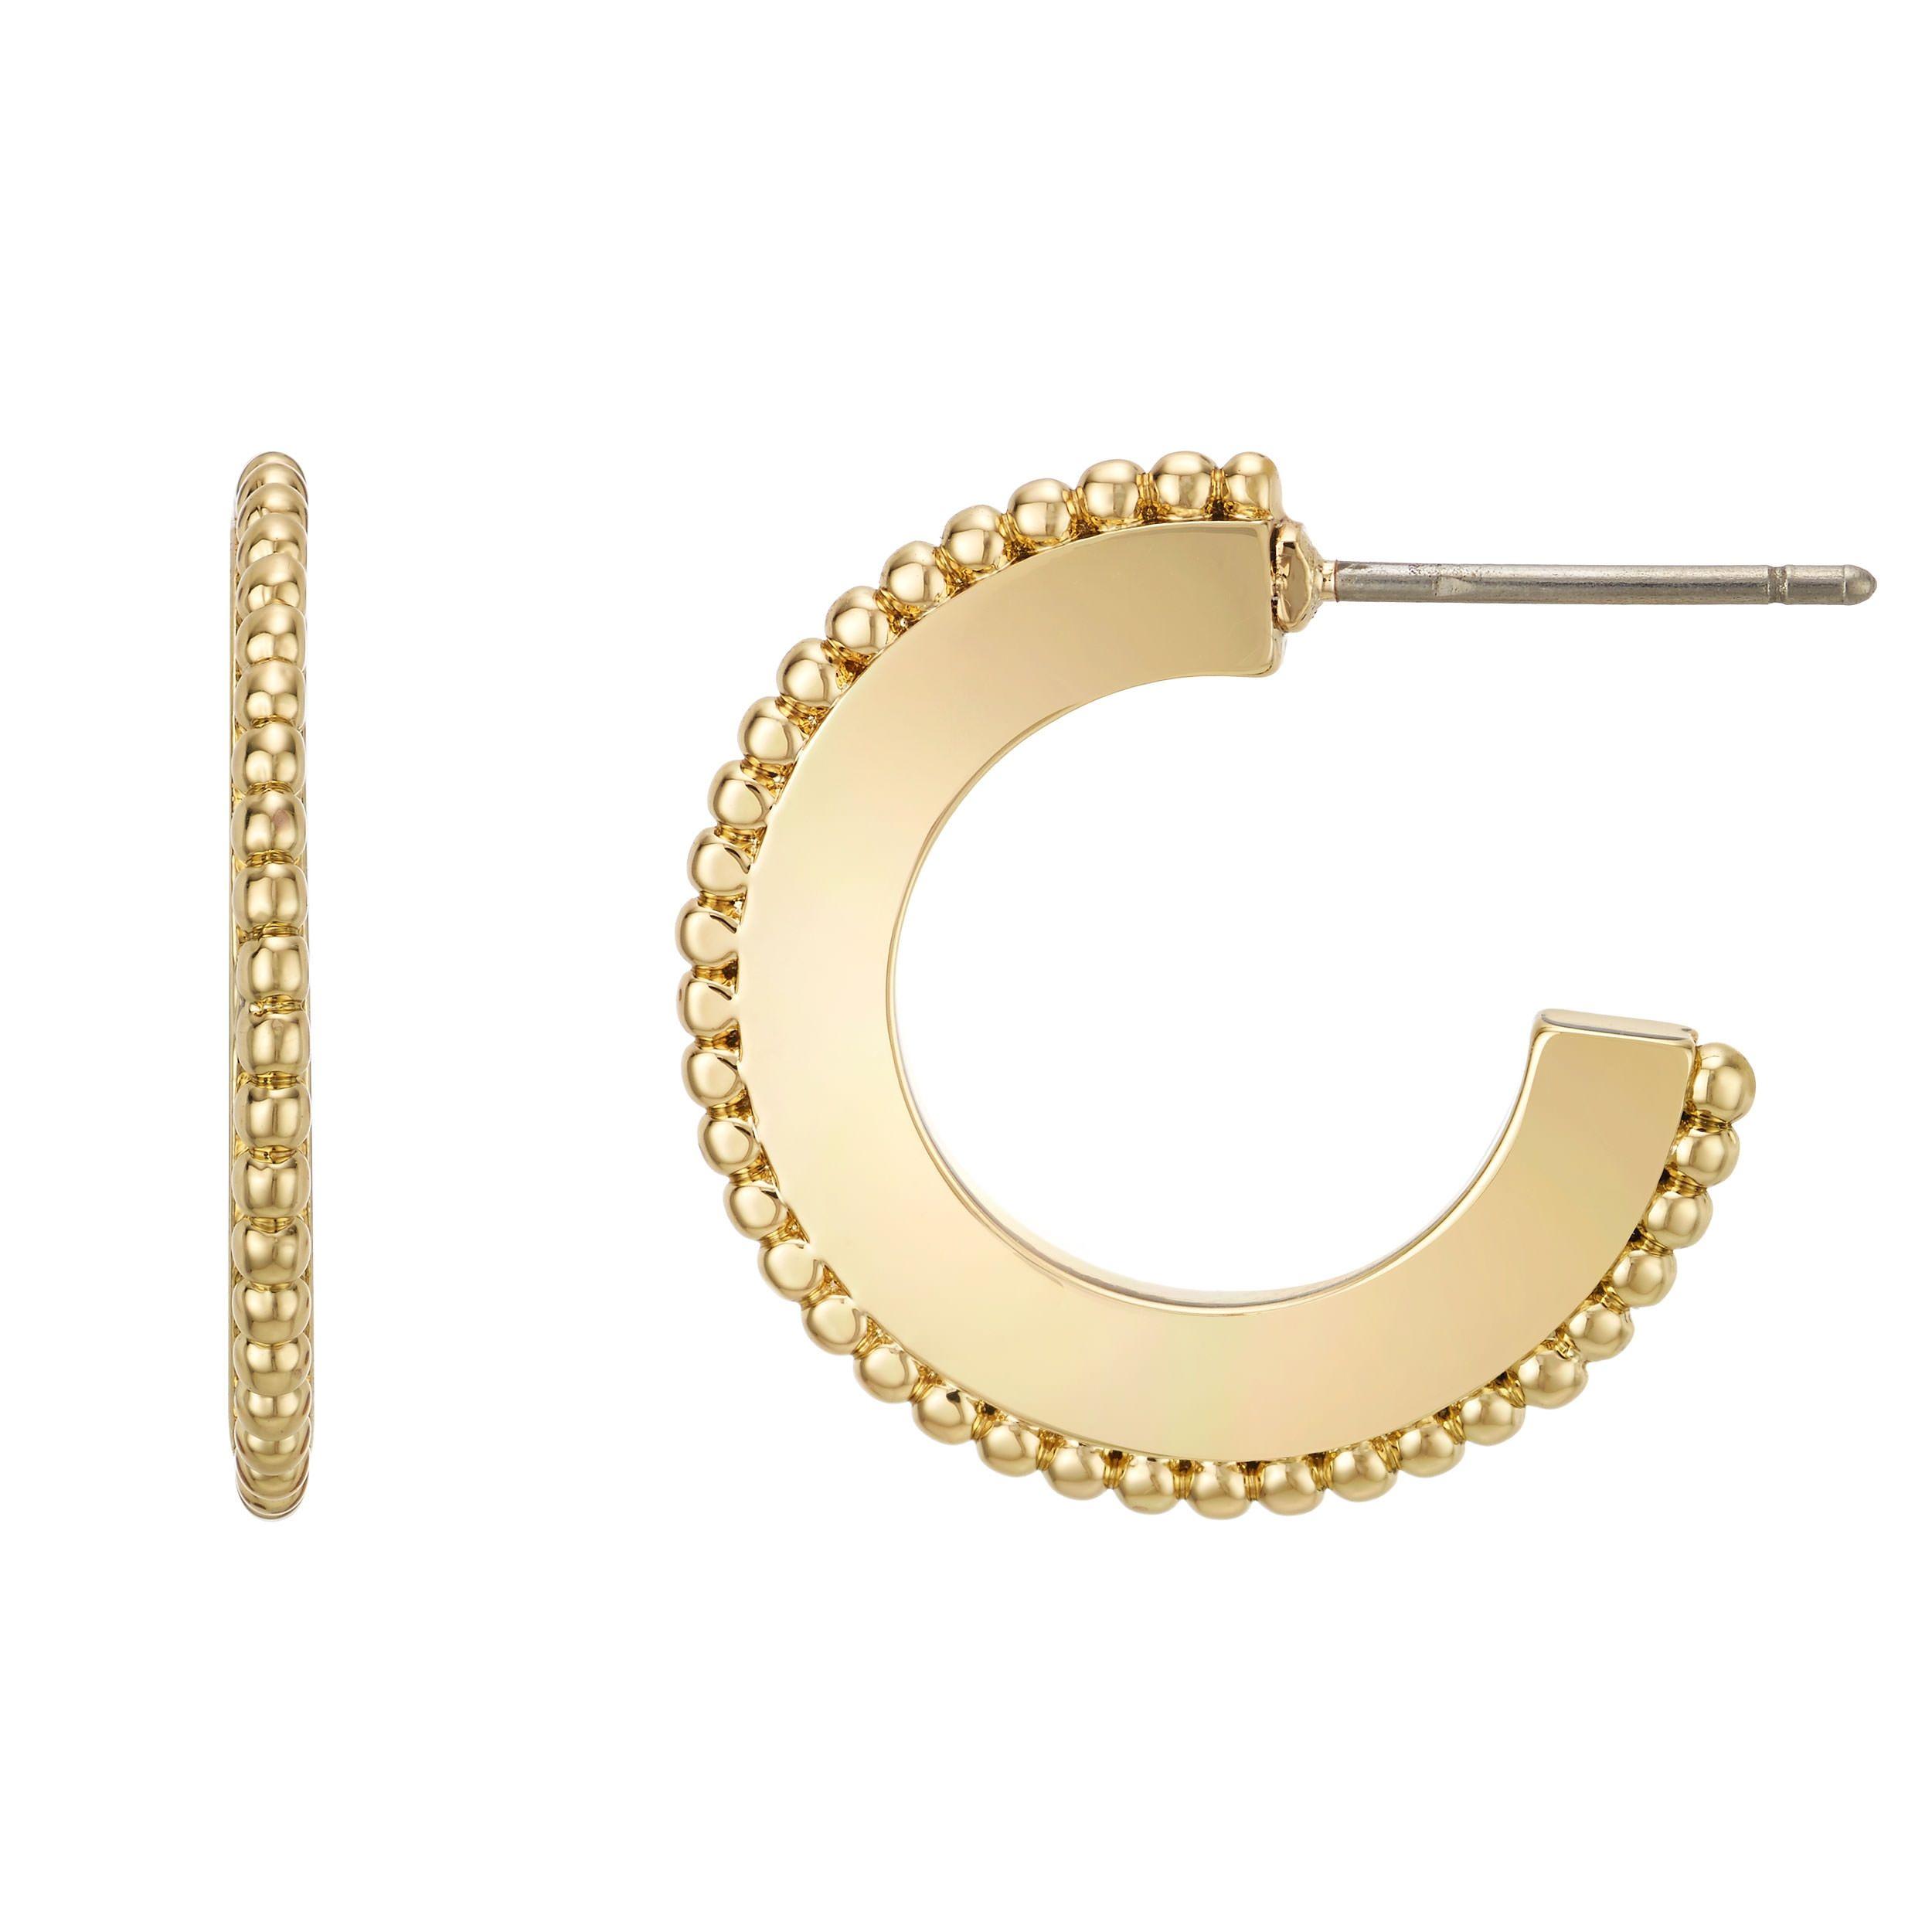 Buckley London La Havas Hoop Earrings